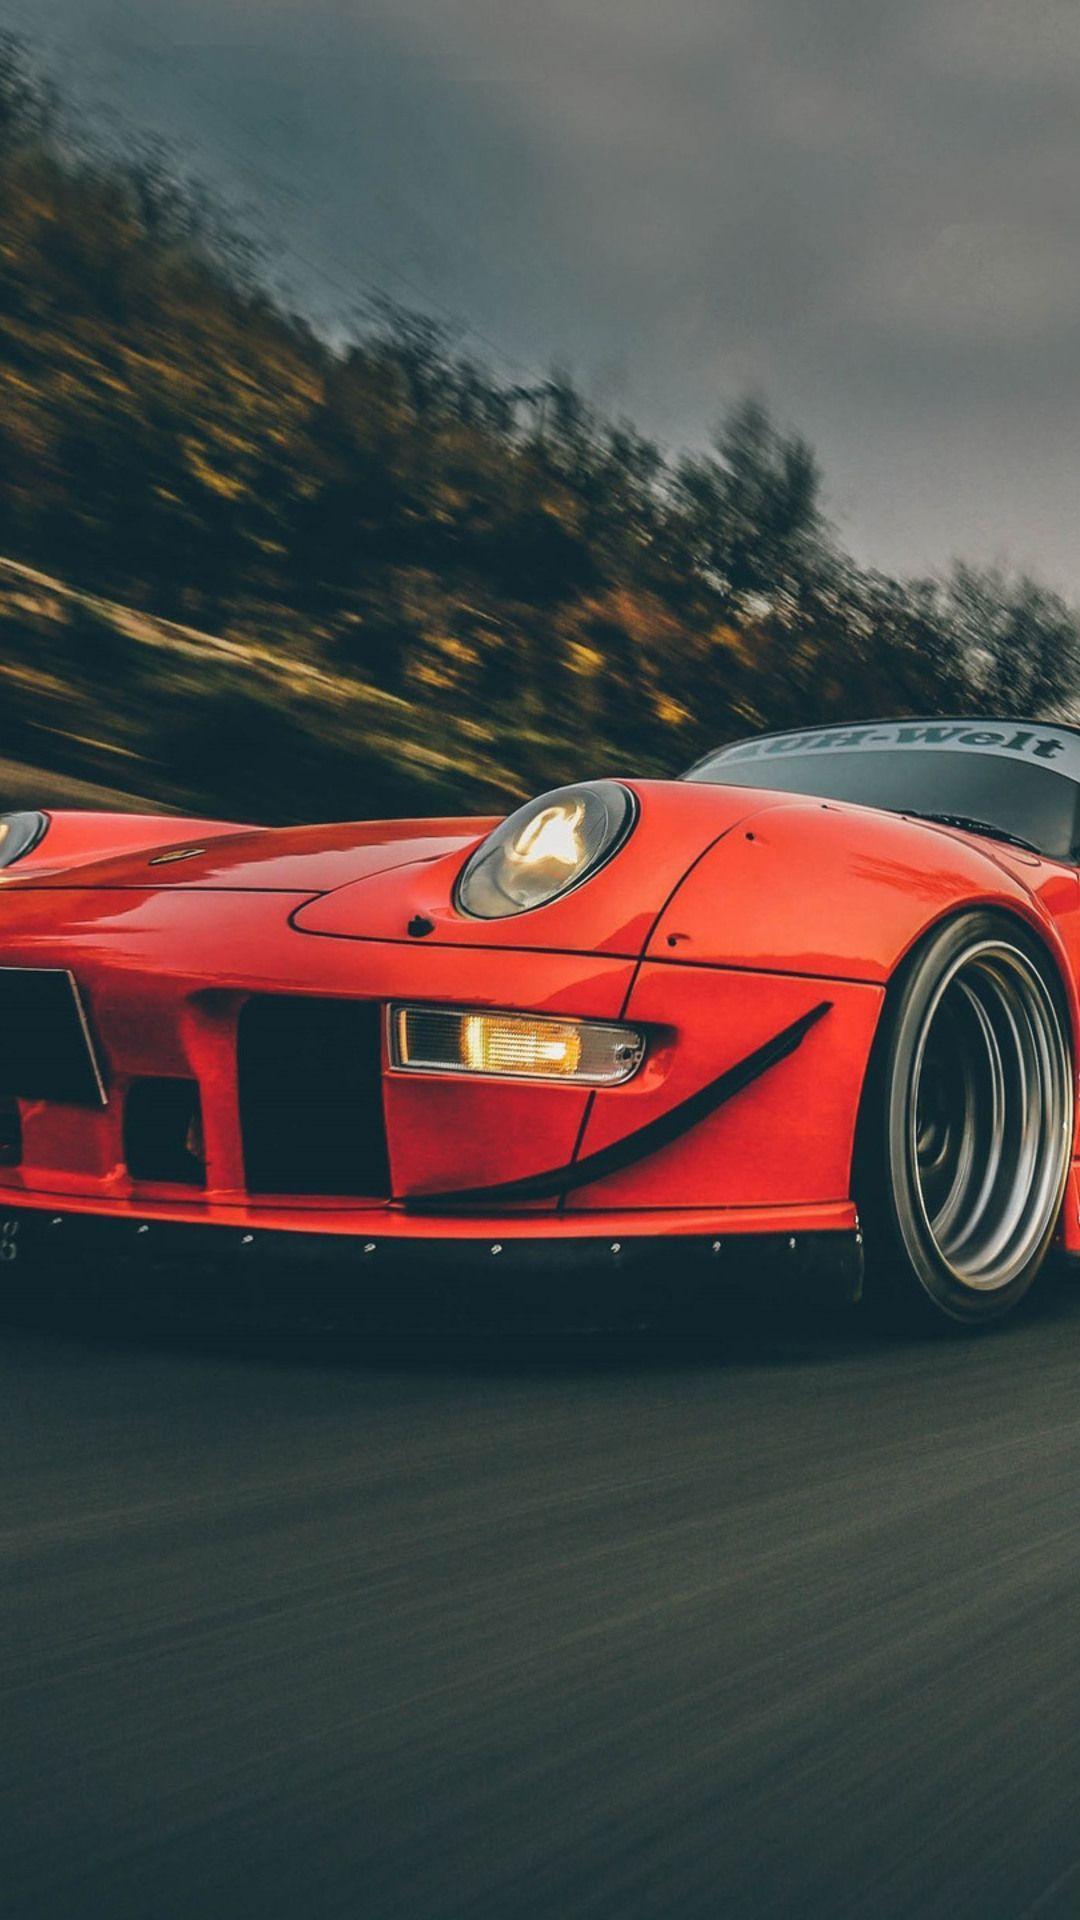 Porsche Macan Wallpaper Iphone Rwb Wallpapers Wallpaper Cave